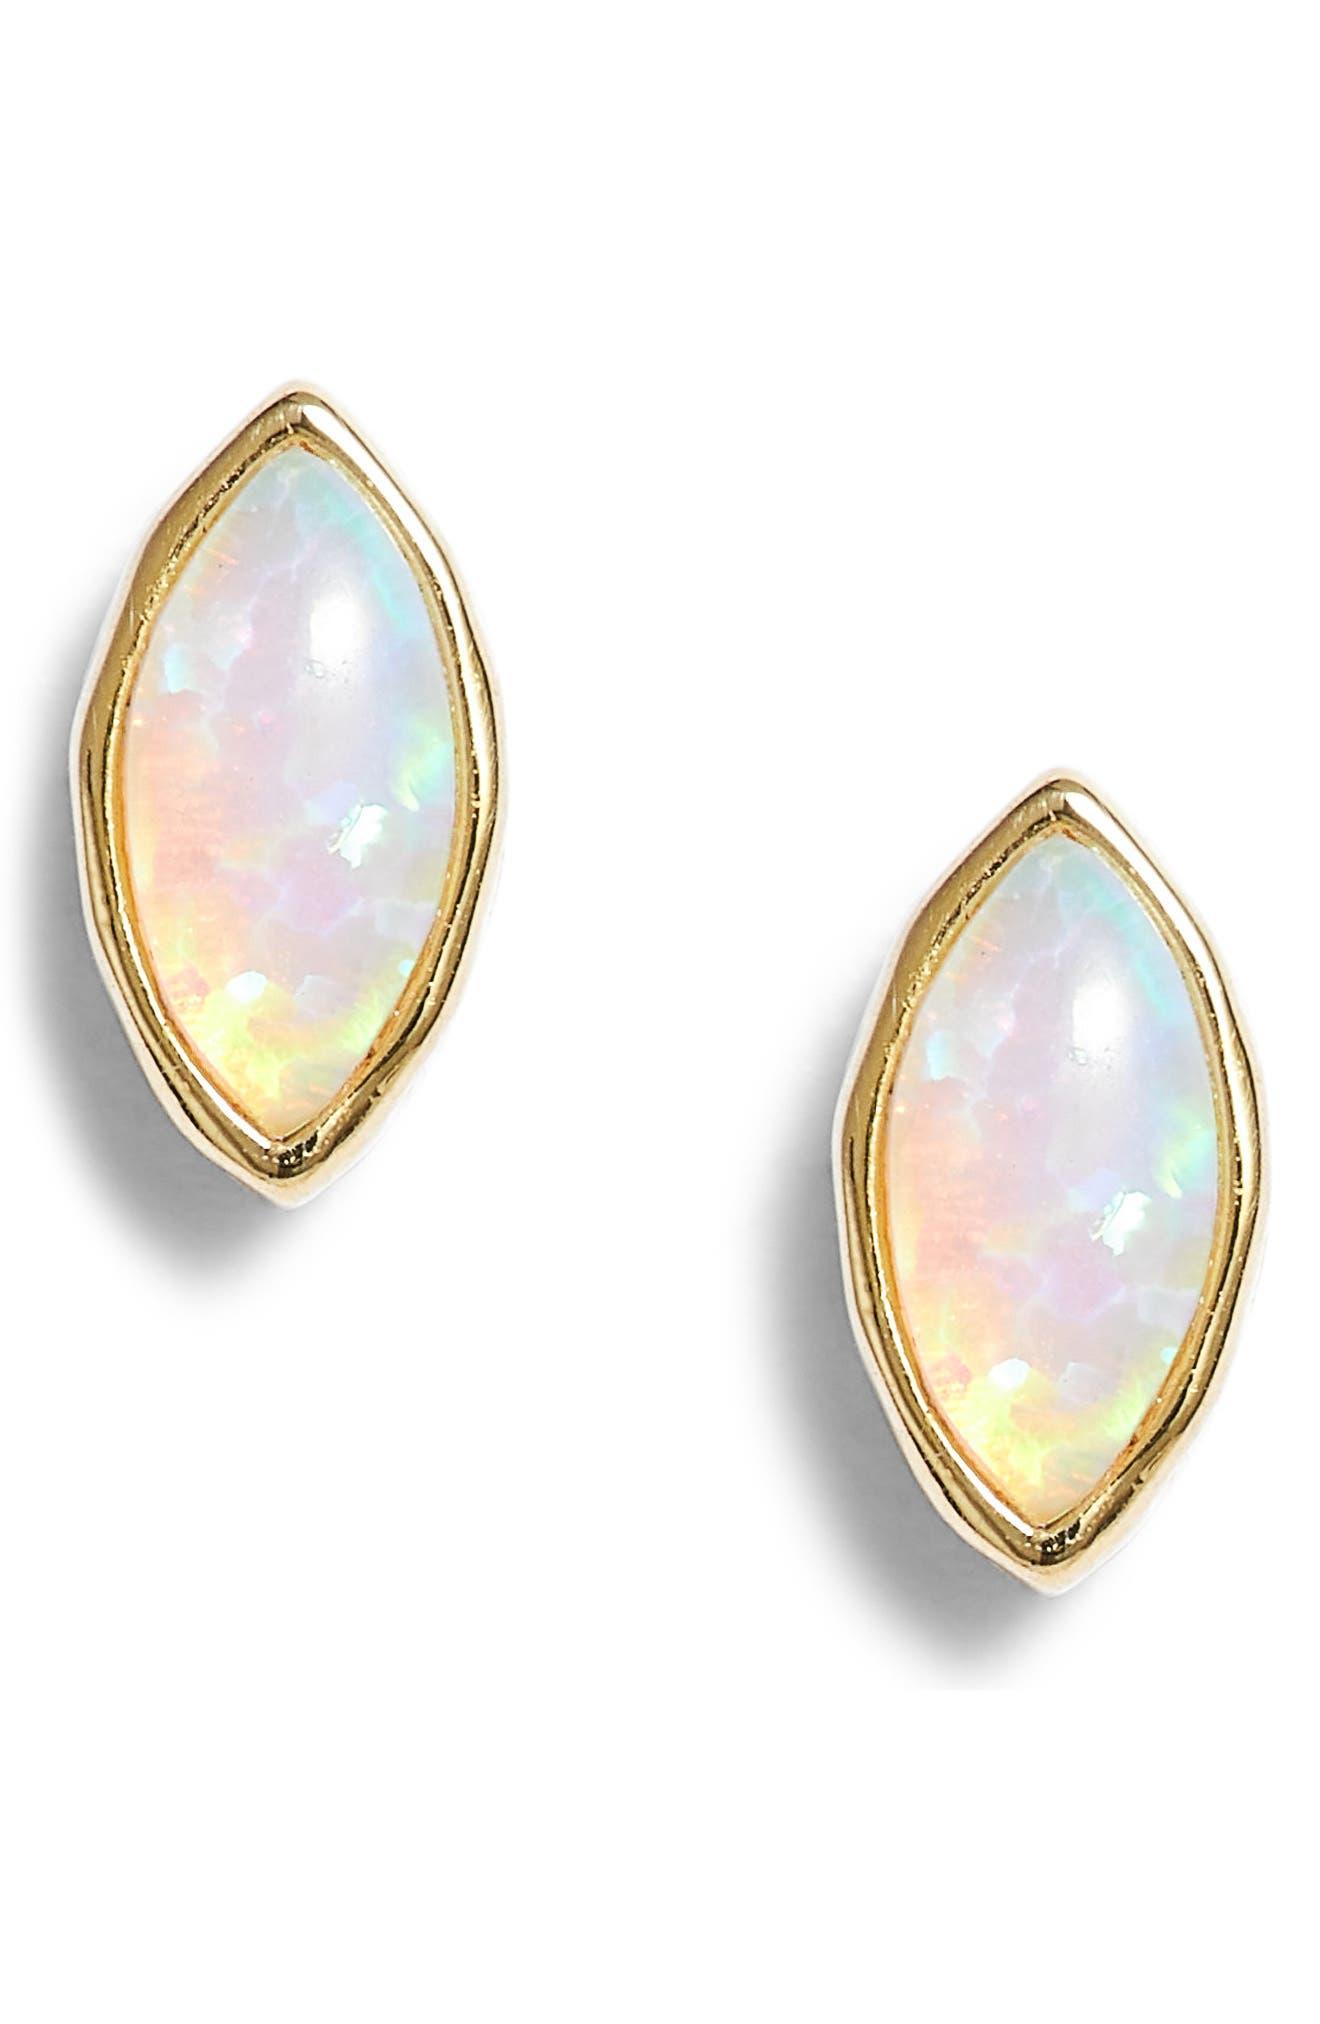 Rumi Opalite Stud Earrings,                             Main thumbnail 1, color,